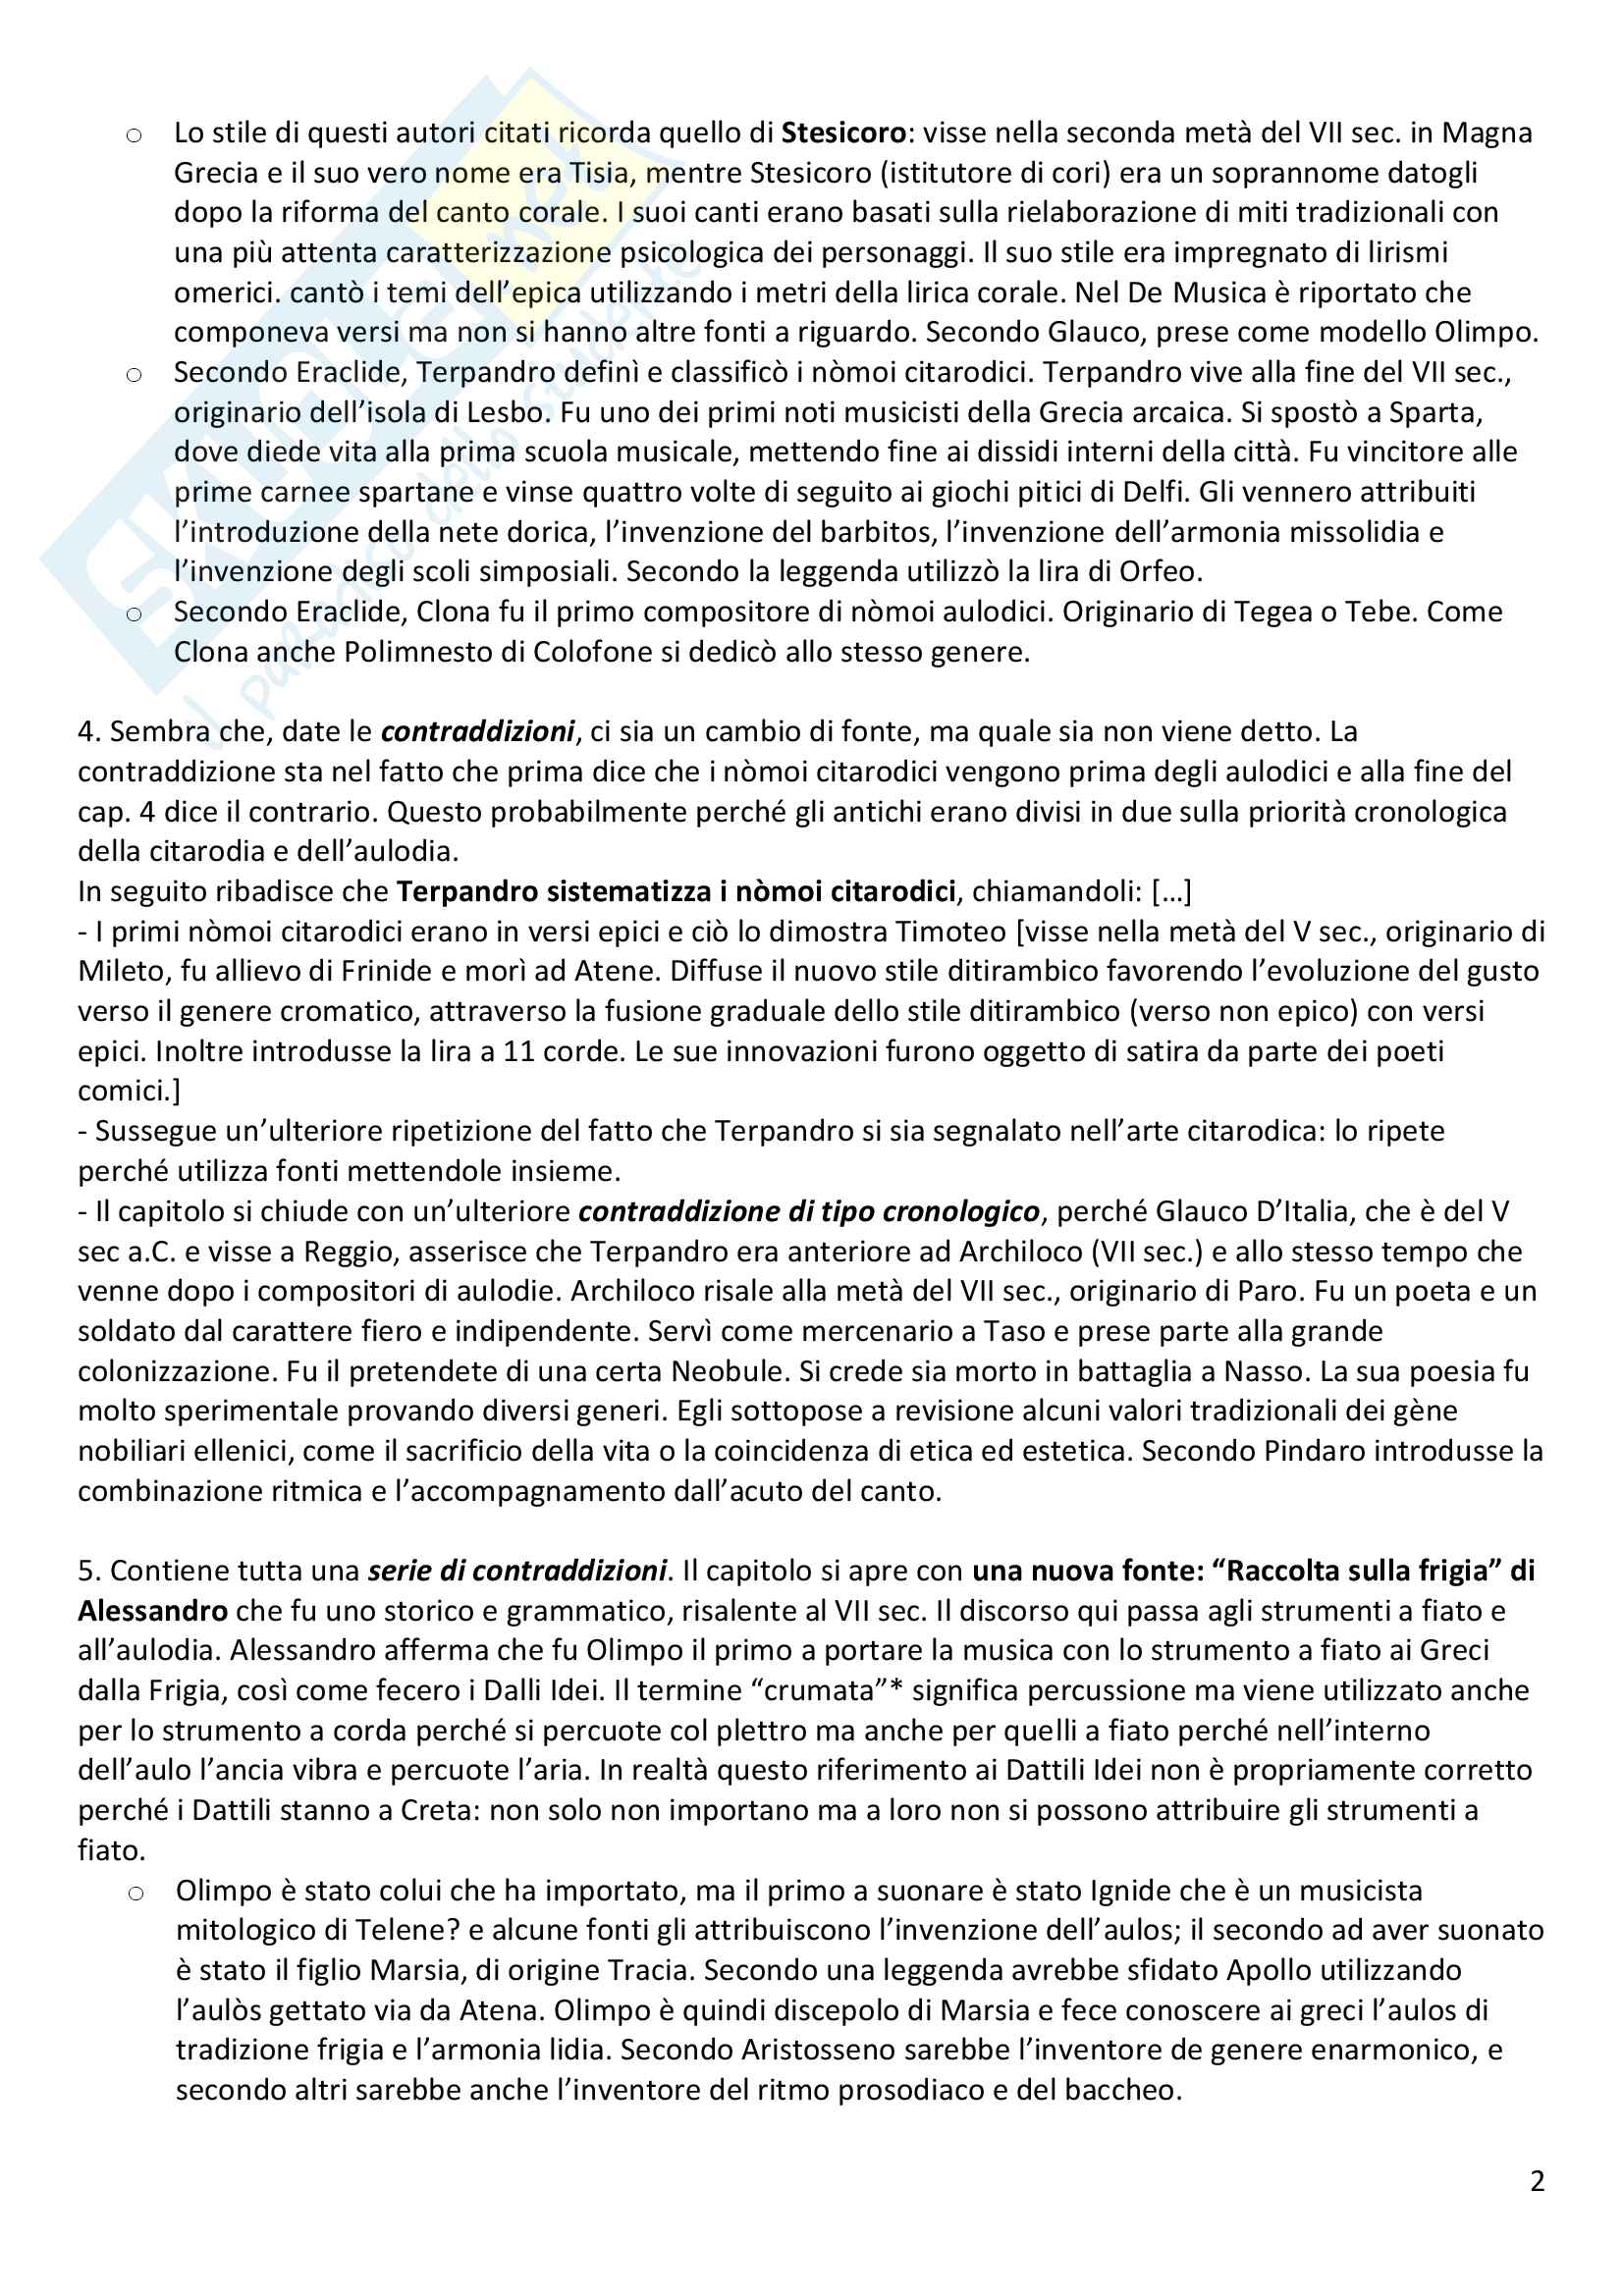 Riassunto, commento ed analisi De musica, Plutarco Pag. 2